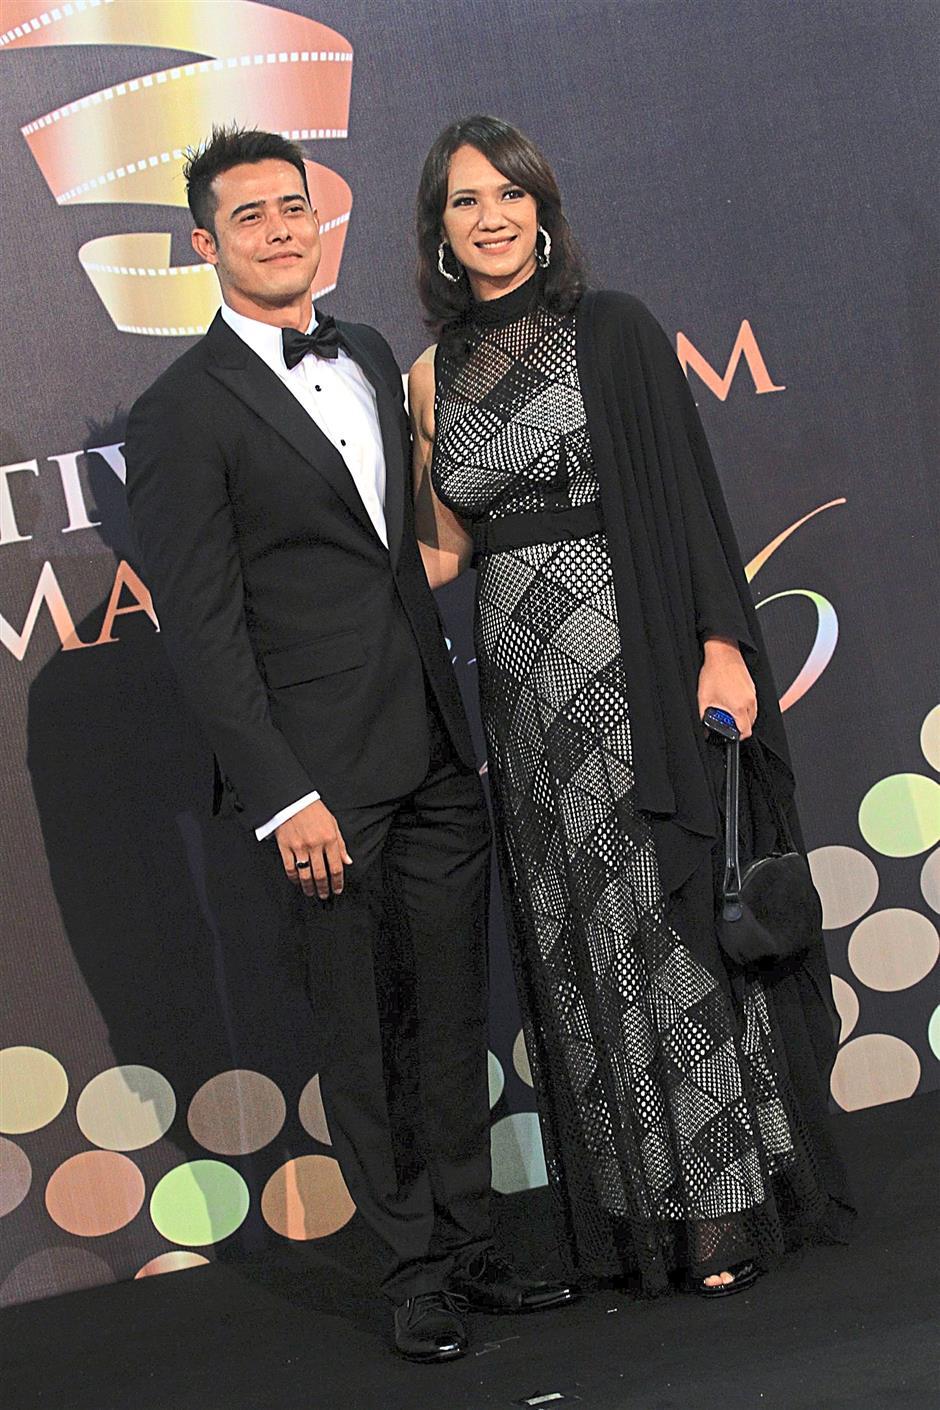 Best New Actor winner Zul Ariffin with Astro Shaw executive producer Gayatri Su-Lin Pillai.